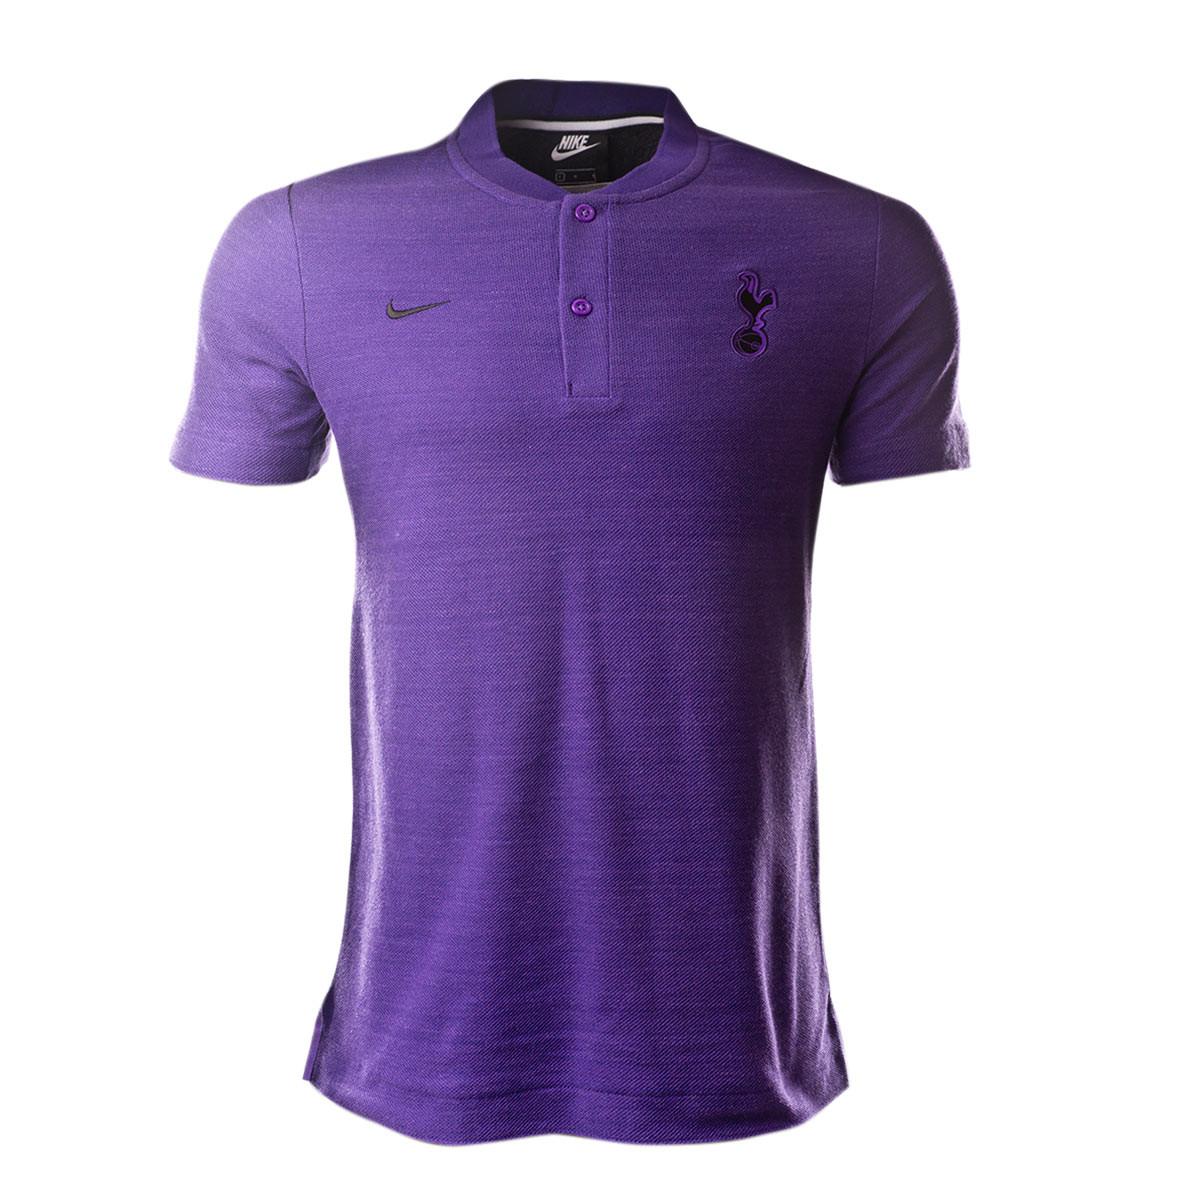 Polo Shirt Nike Tottenham Hotspur Fc 2018 2019 Action Grape Hyper Grape Black Football Store Futbol Emotion